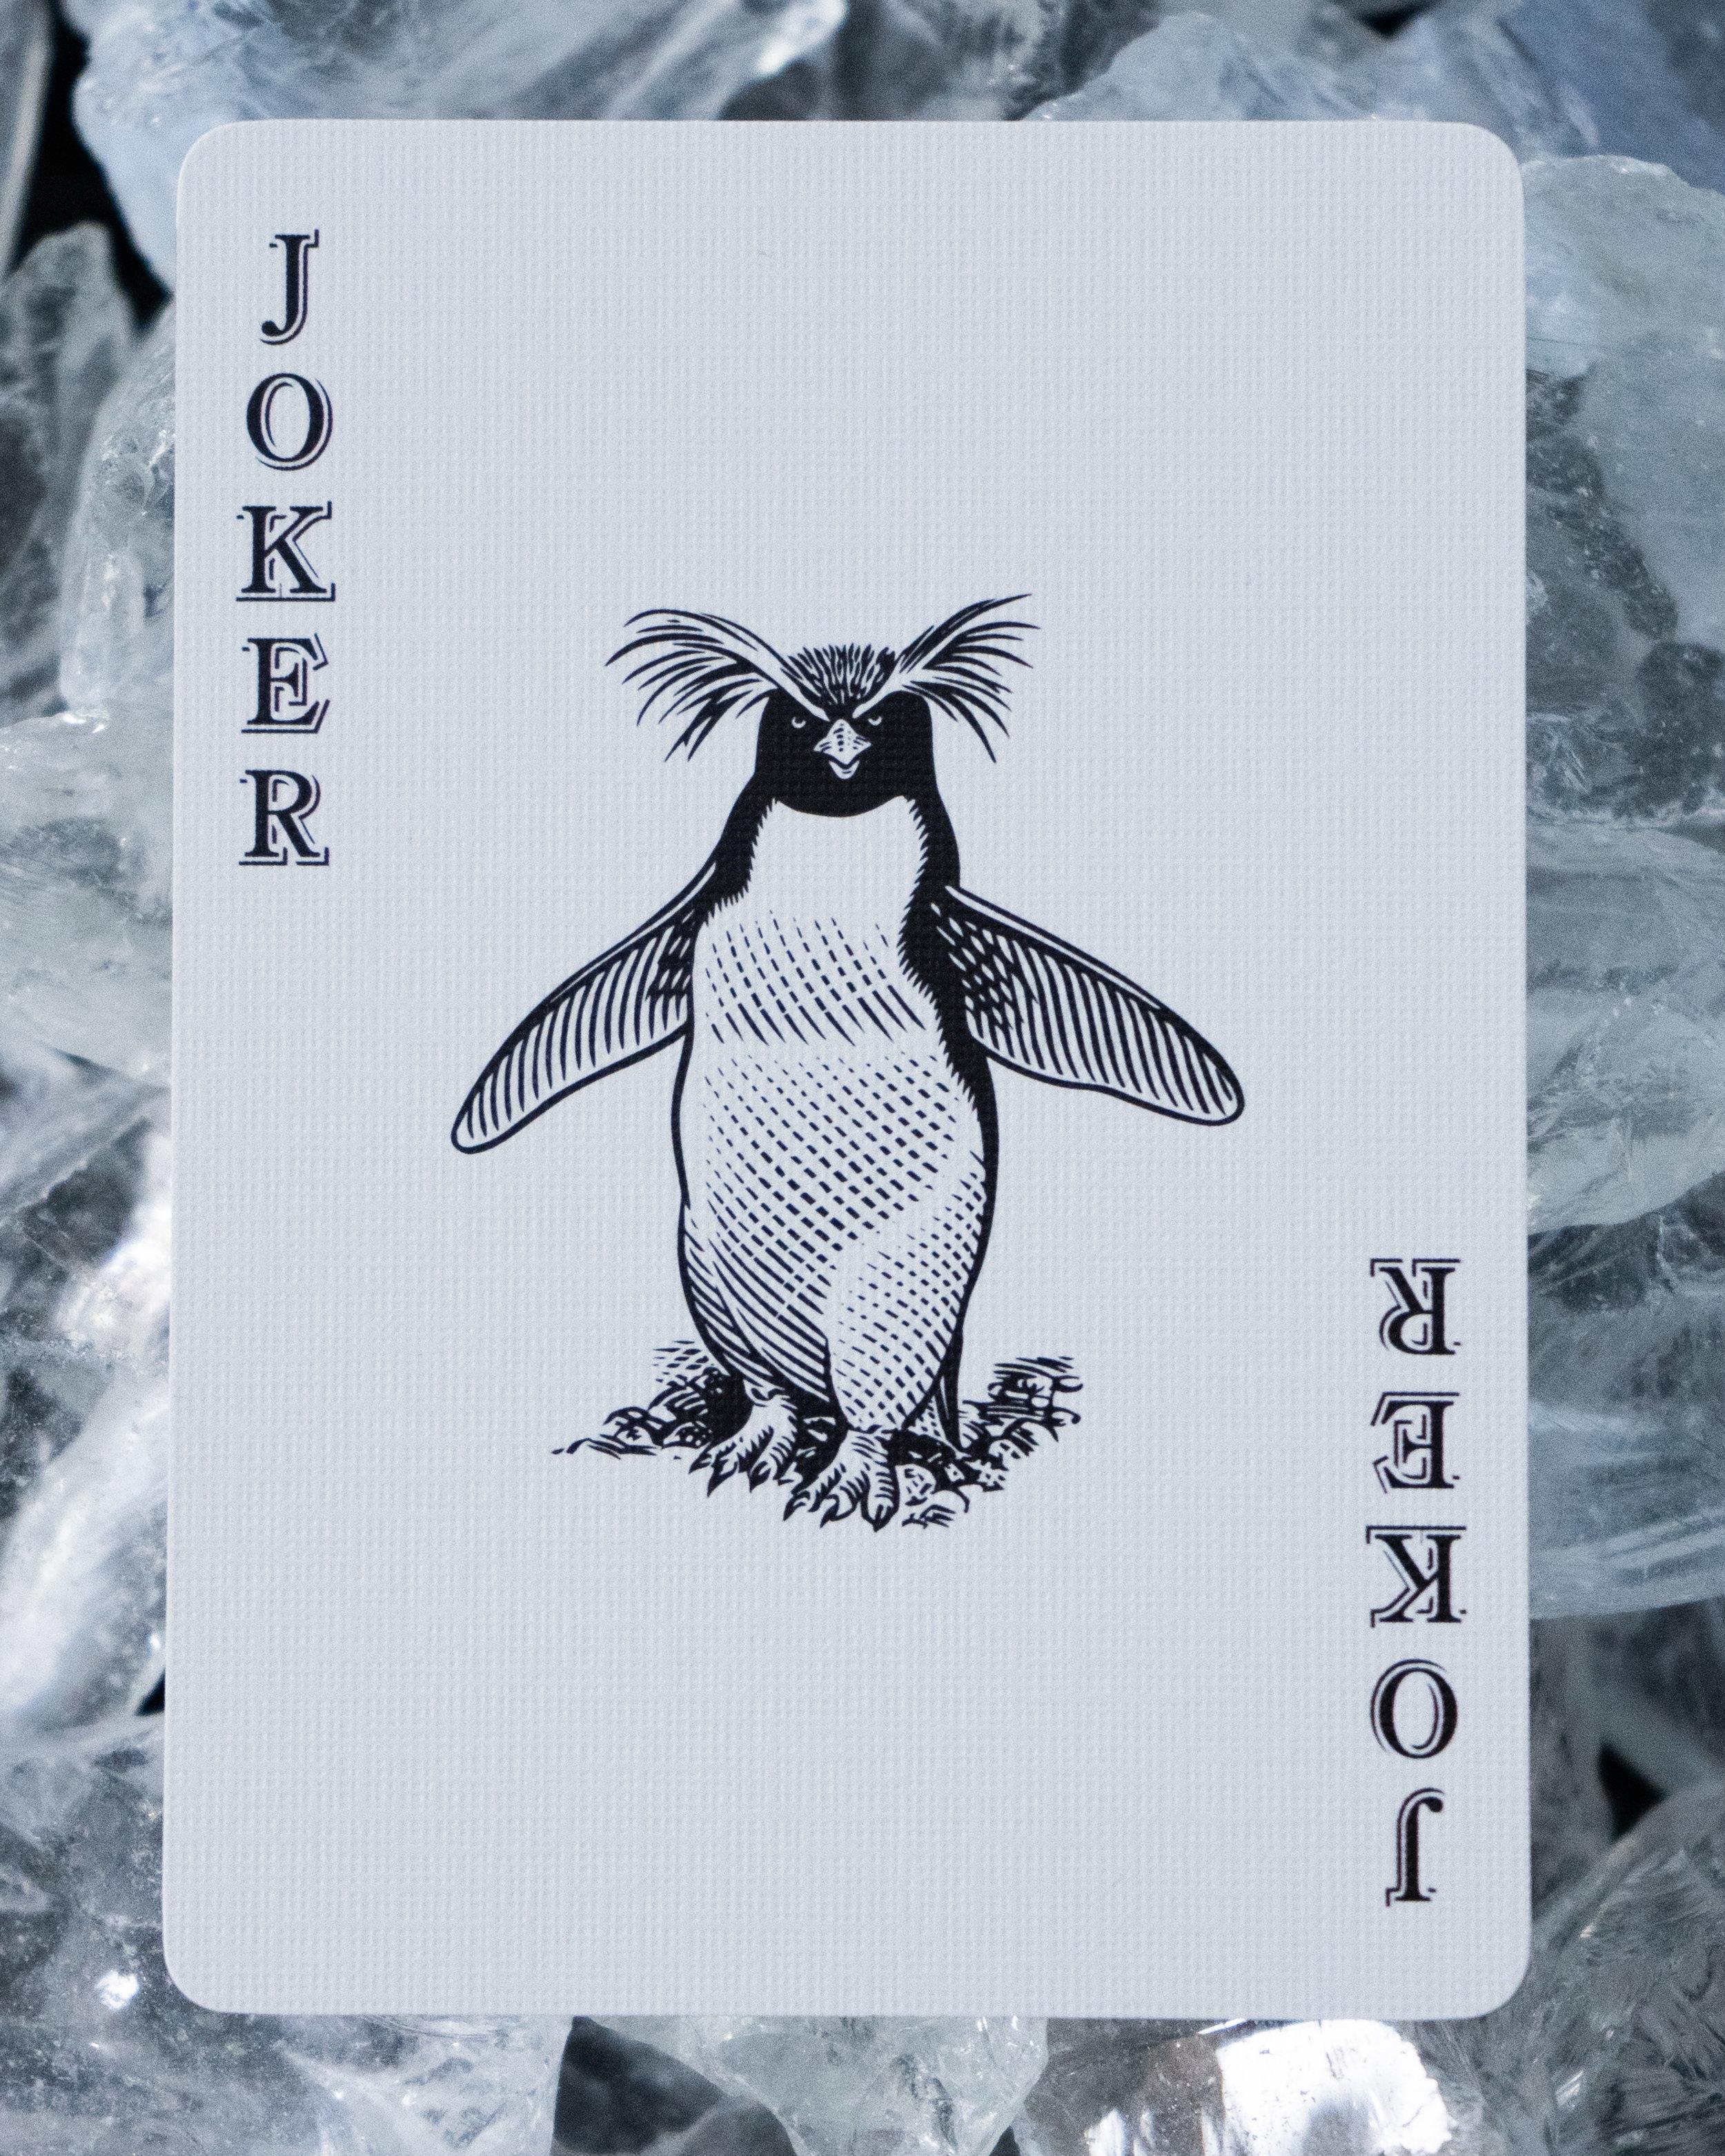 Emperor Joker Ice 4x5.jpg